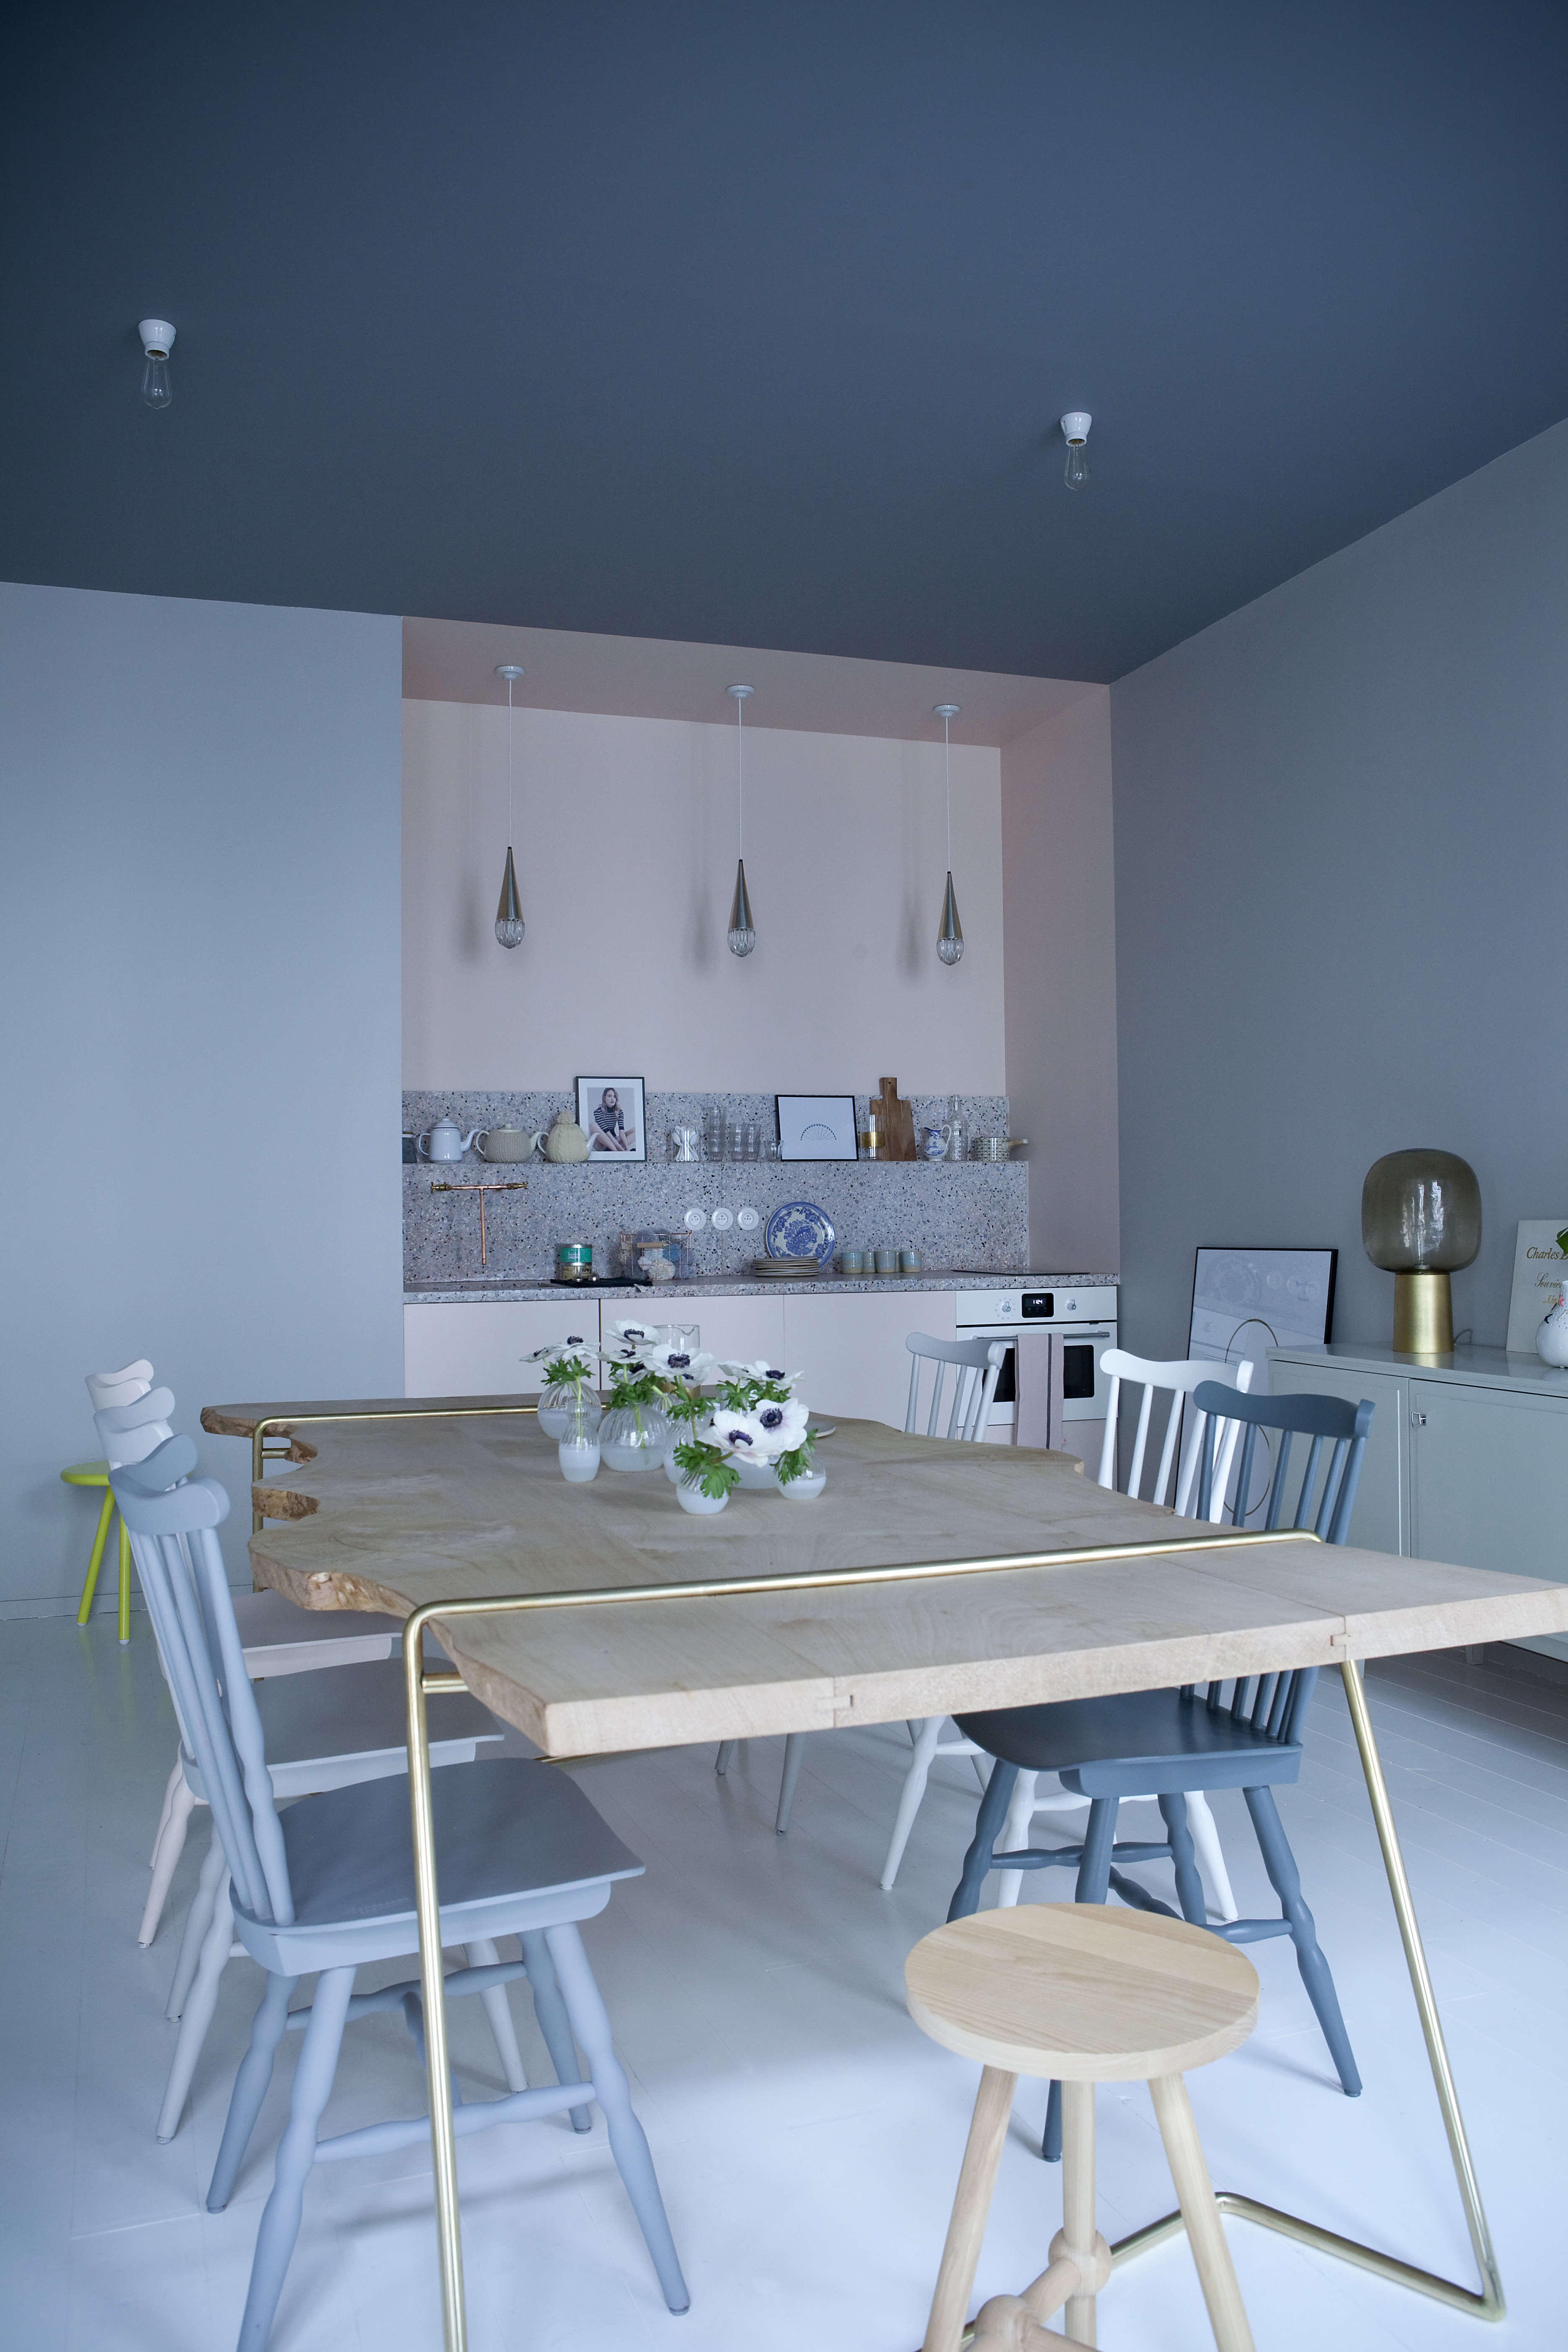 Maison Du Monde Terrazzo chez marie sixtine: the chicest new guest pad in paris